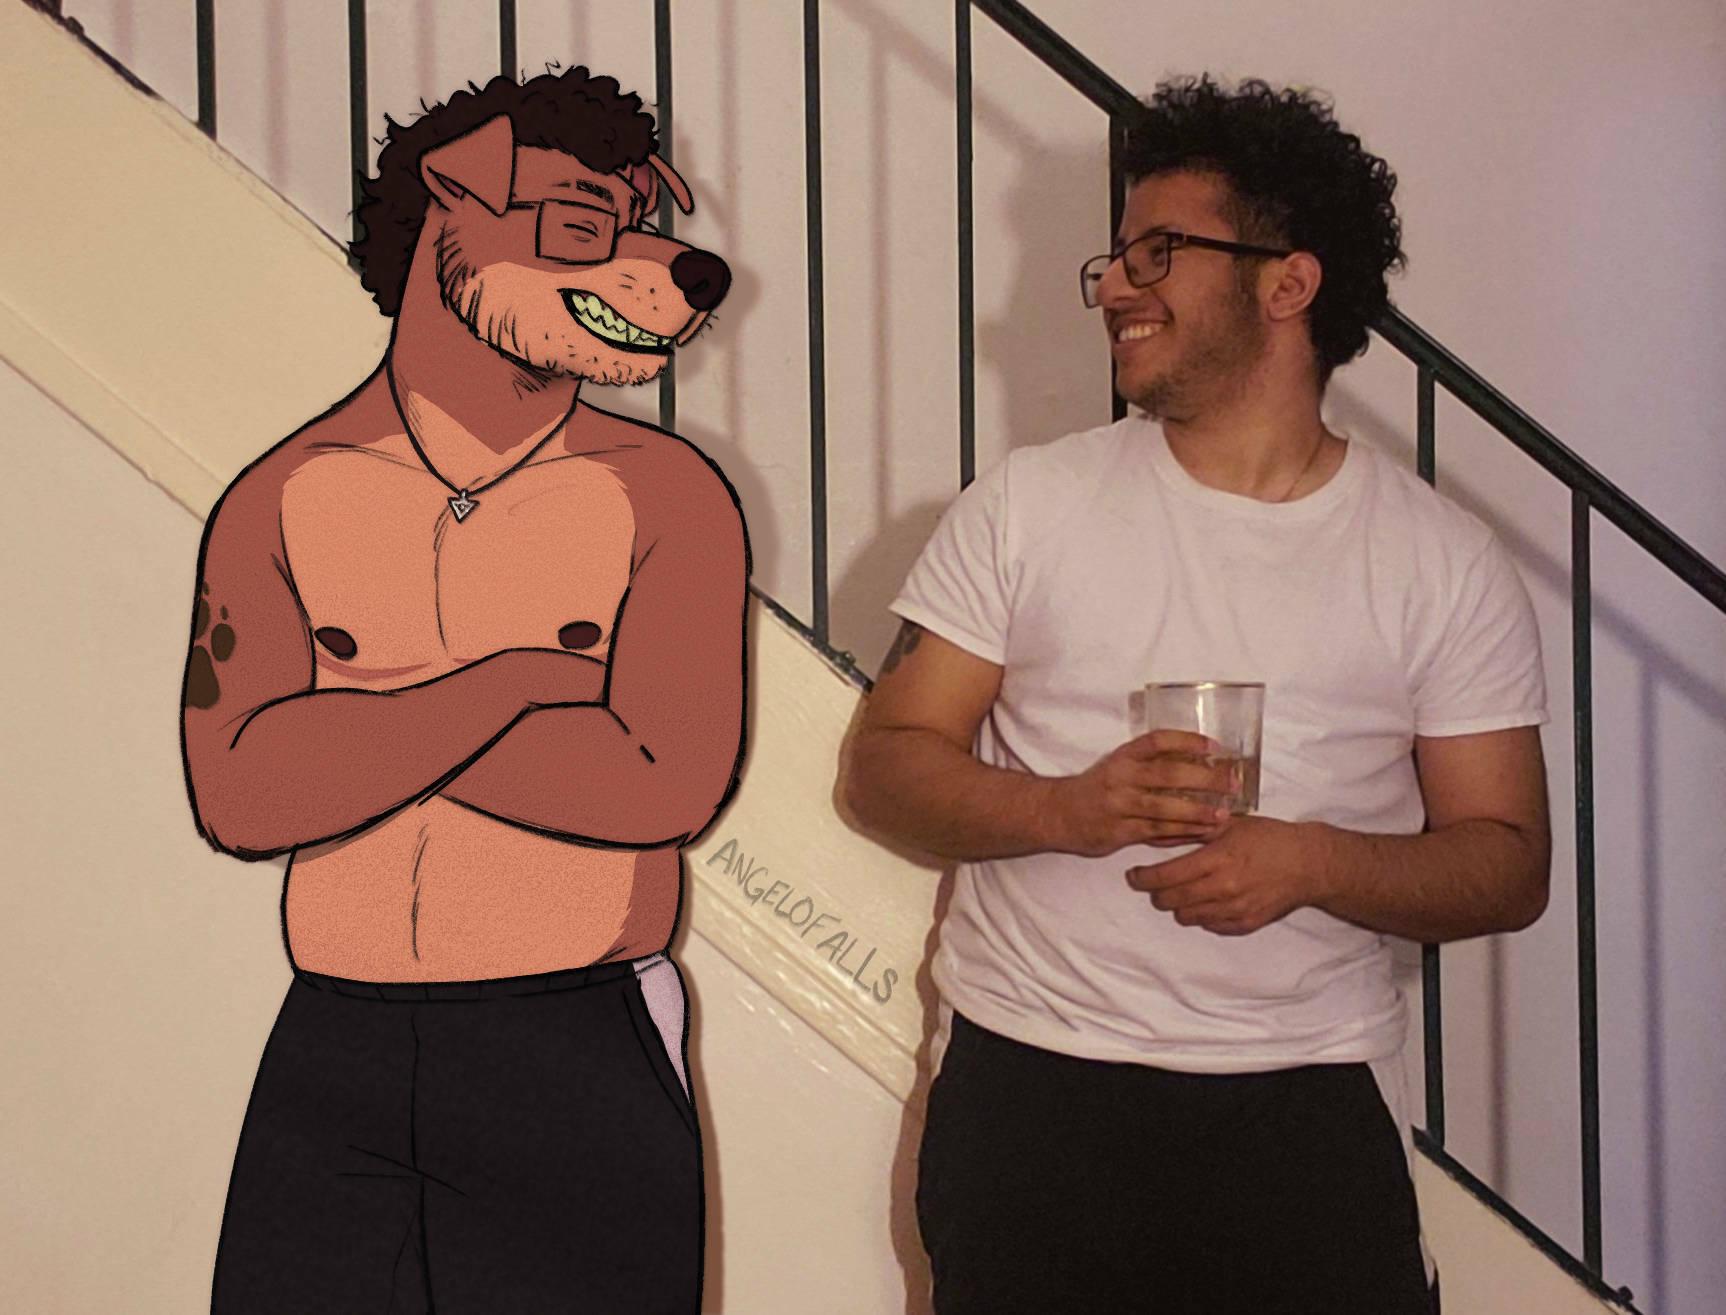 Angelo and Angelo